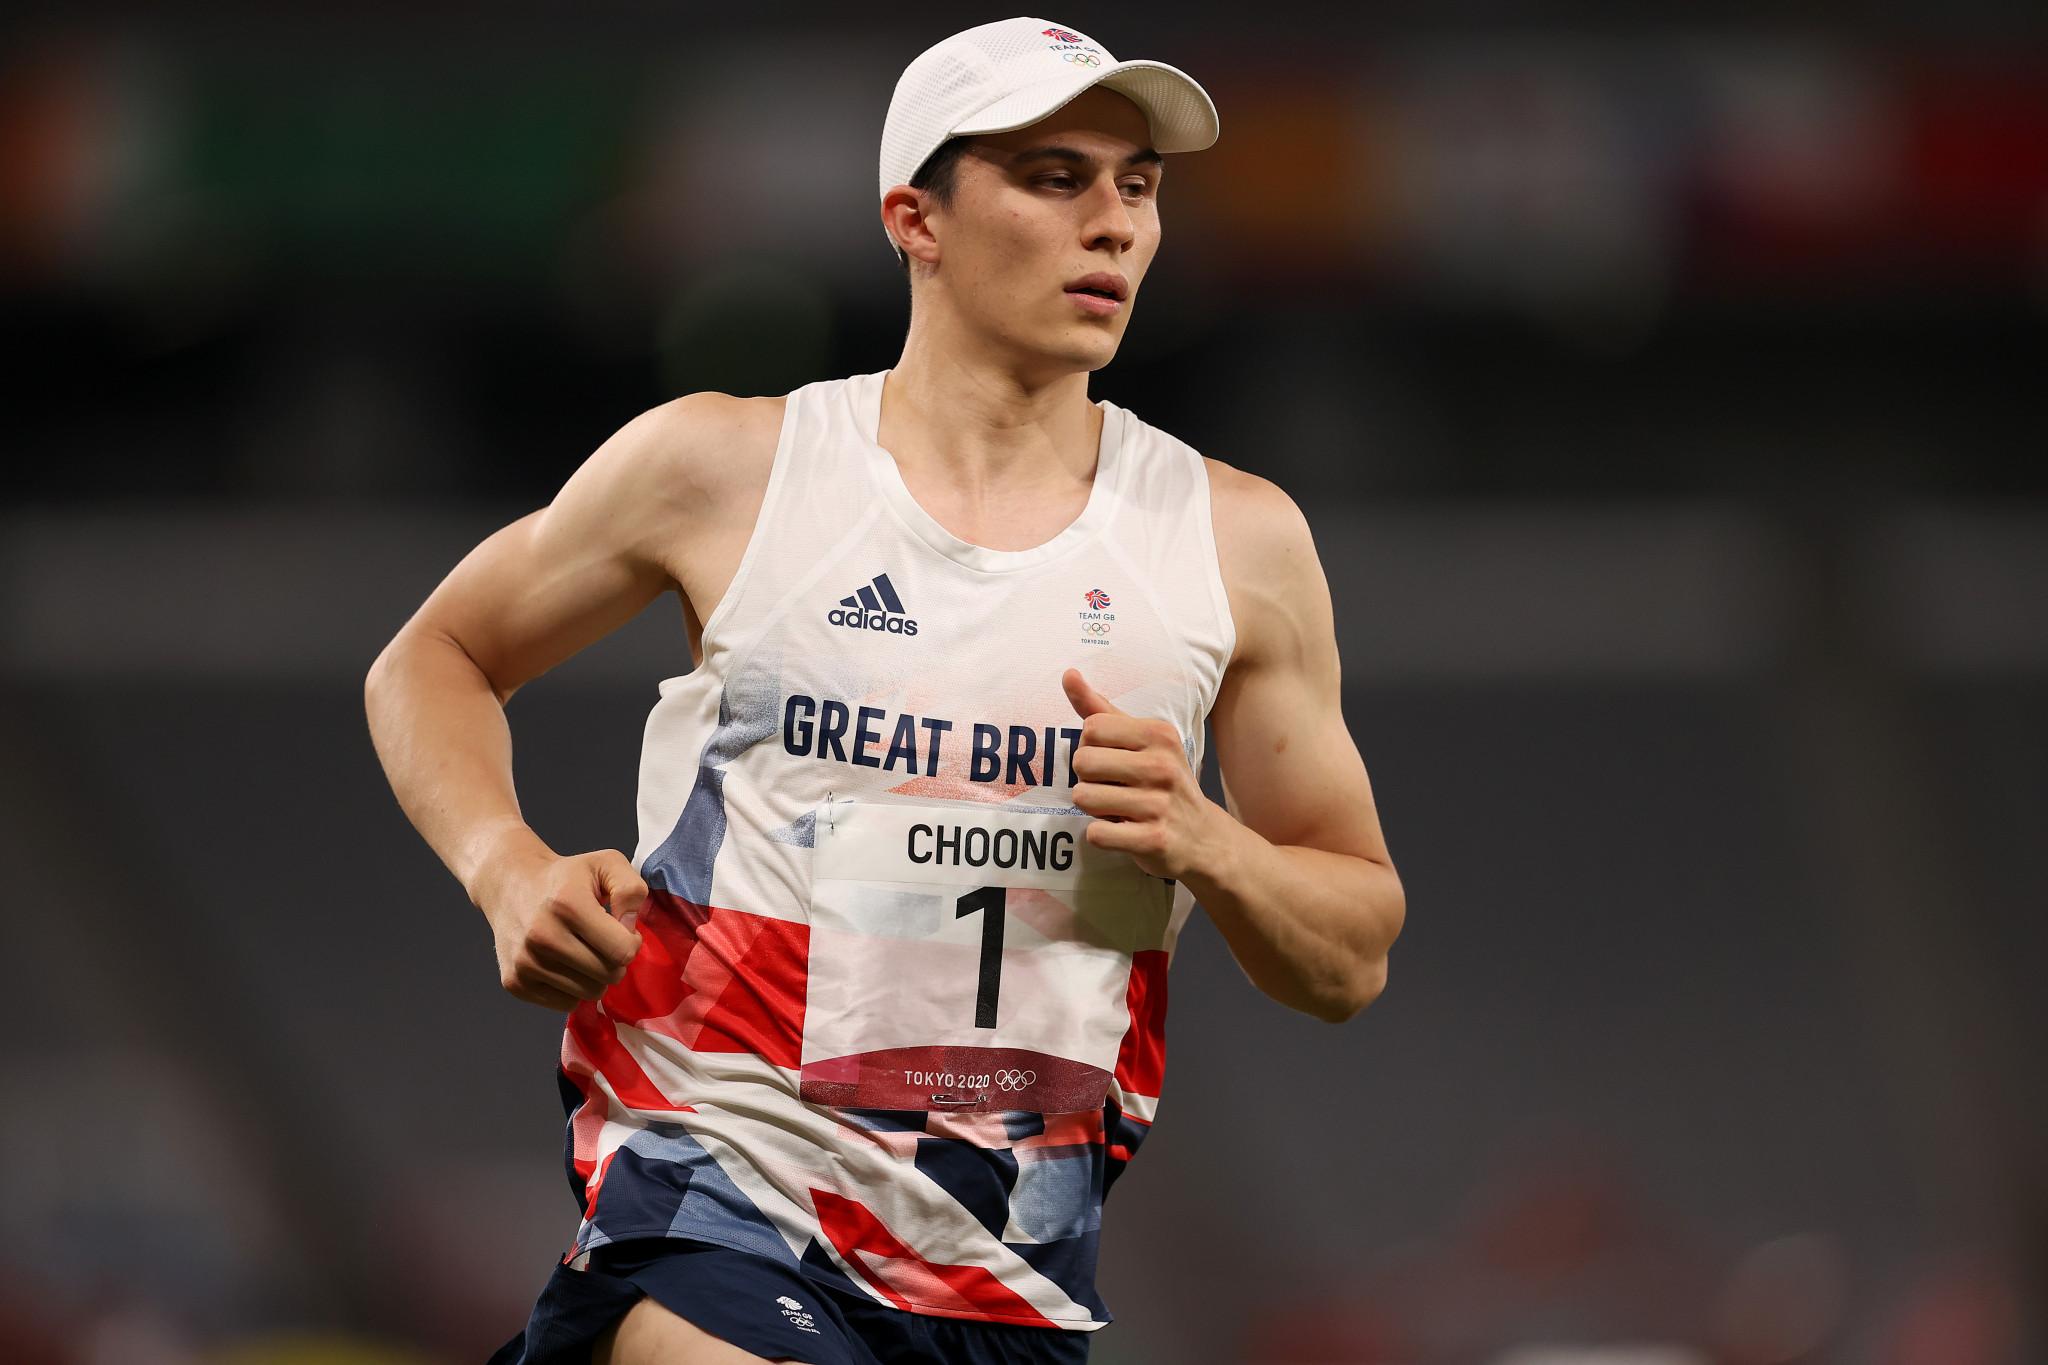 Choong wins men's modern pentathlon title with Olympic record score